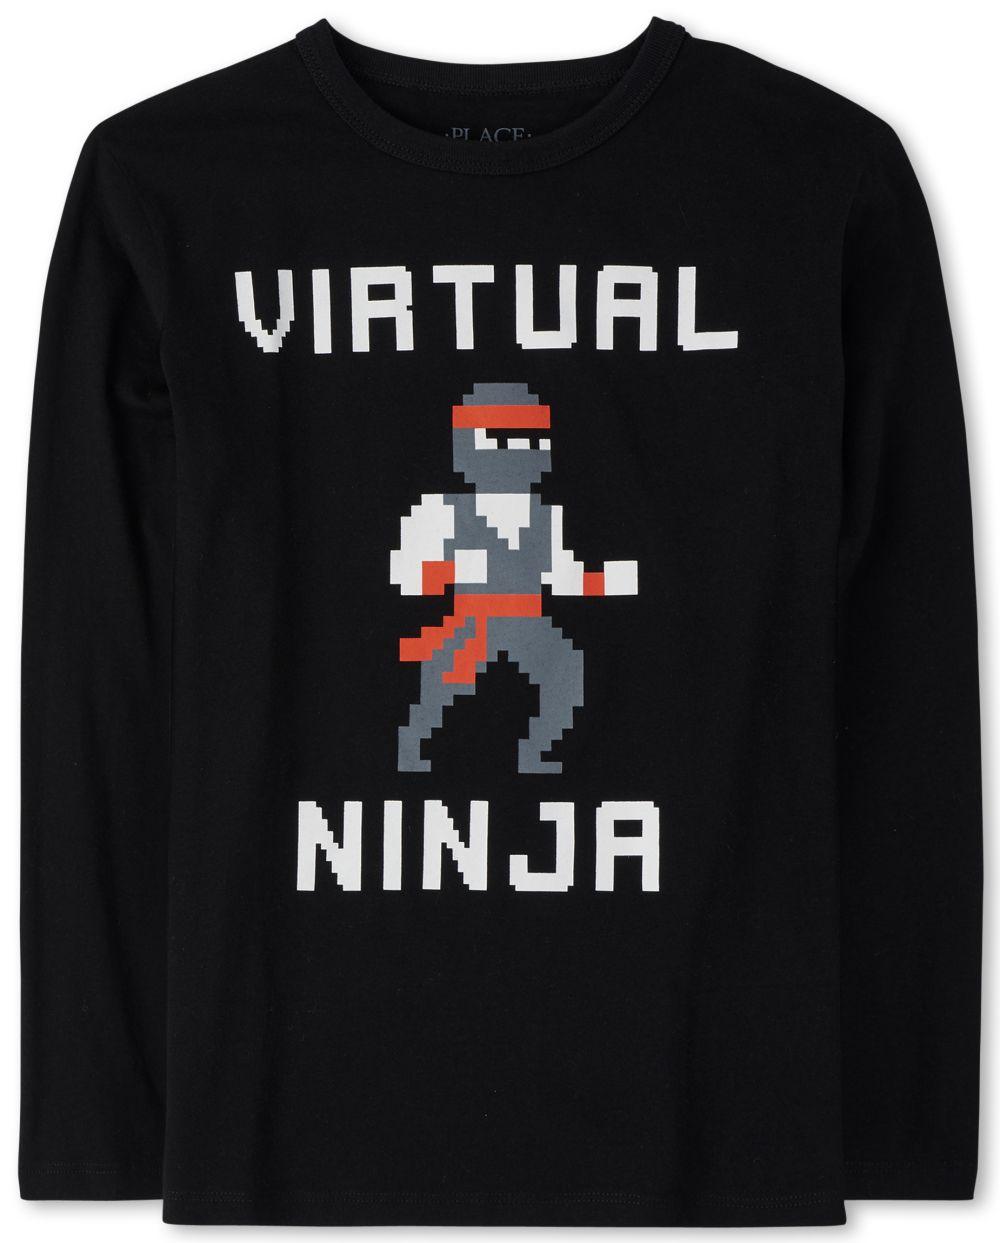 Boys Virtual Ninja Graphic Tee